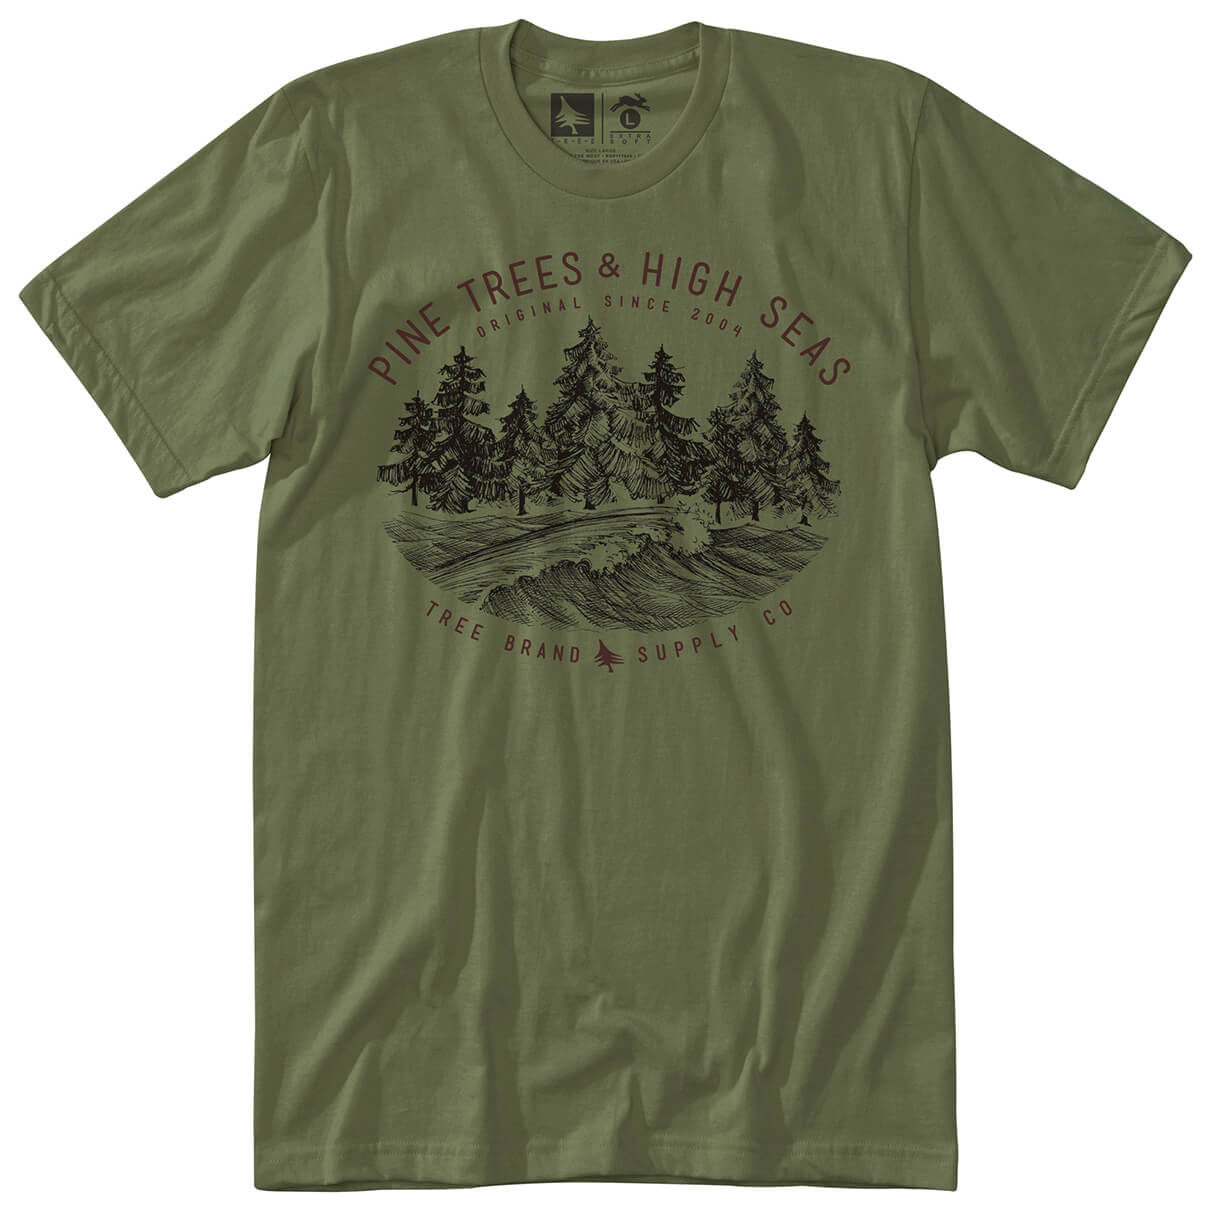 Hippy tree seaside tee t shirt homme achat en ligne for Hippie t shirts australia